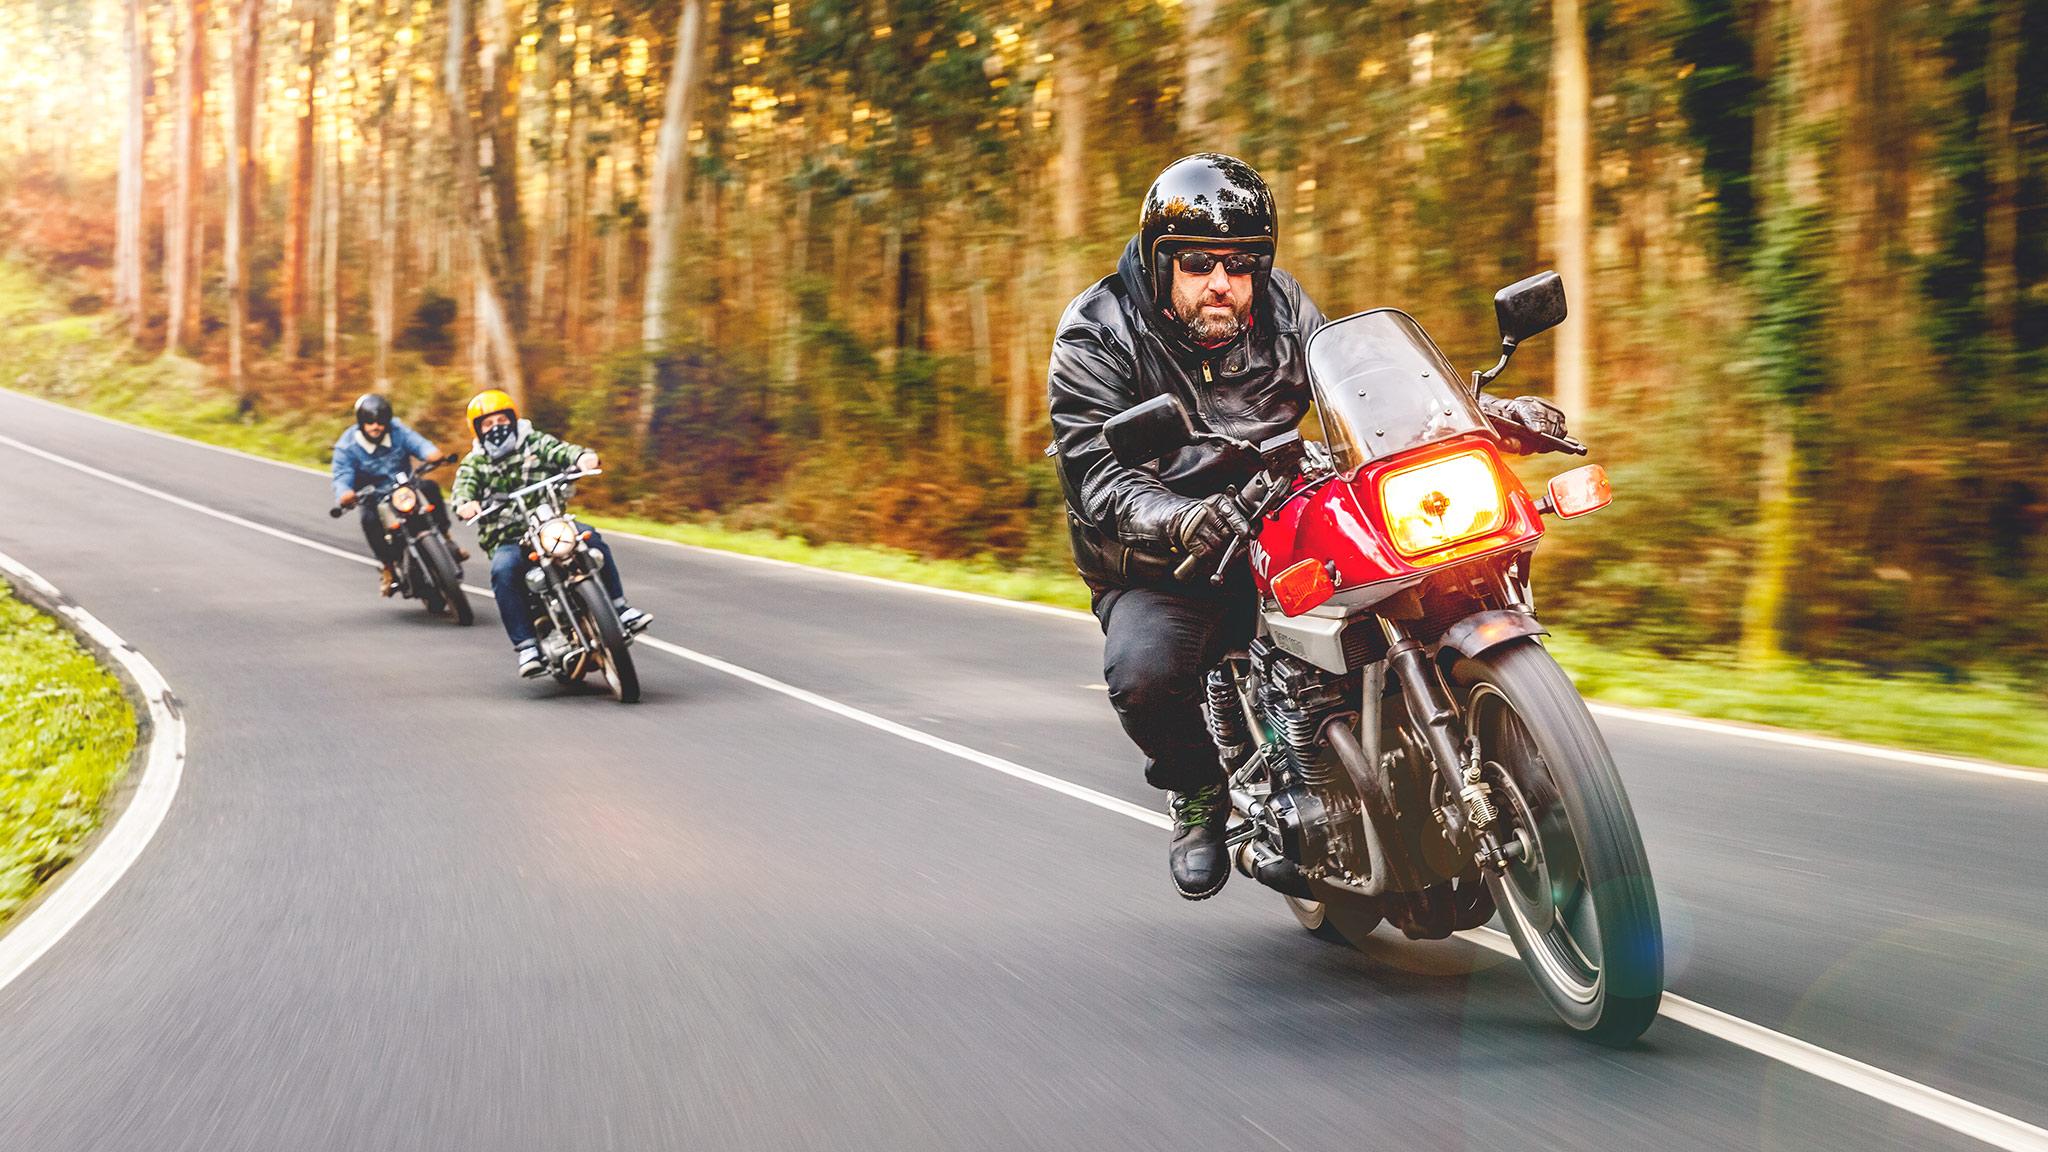 Lee-Kirby-Photography_Motorbike_4.jpg